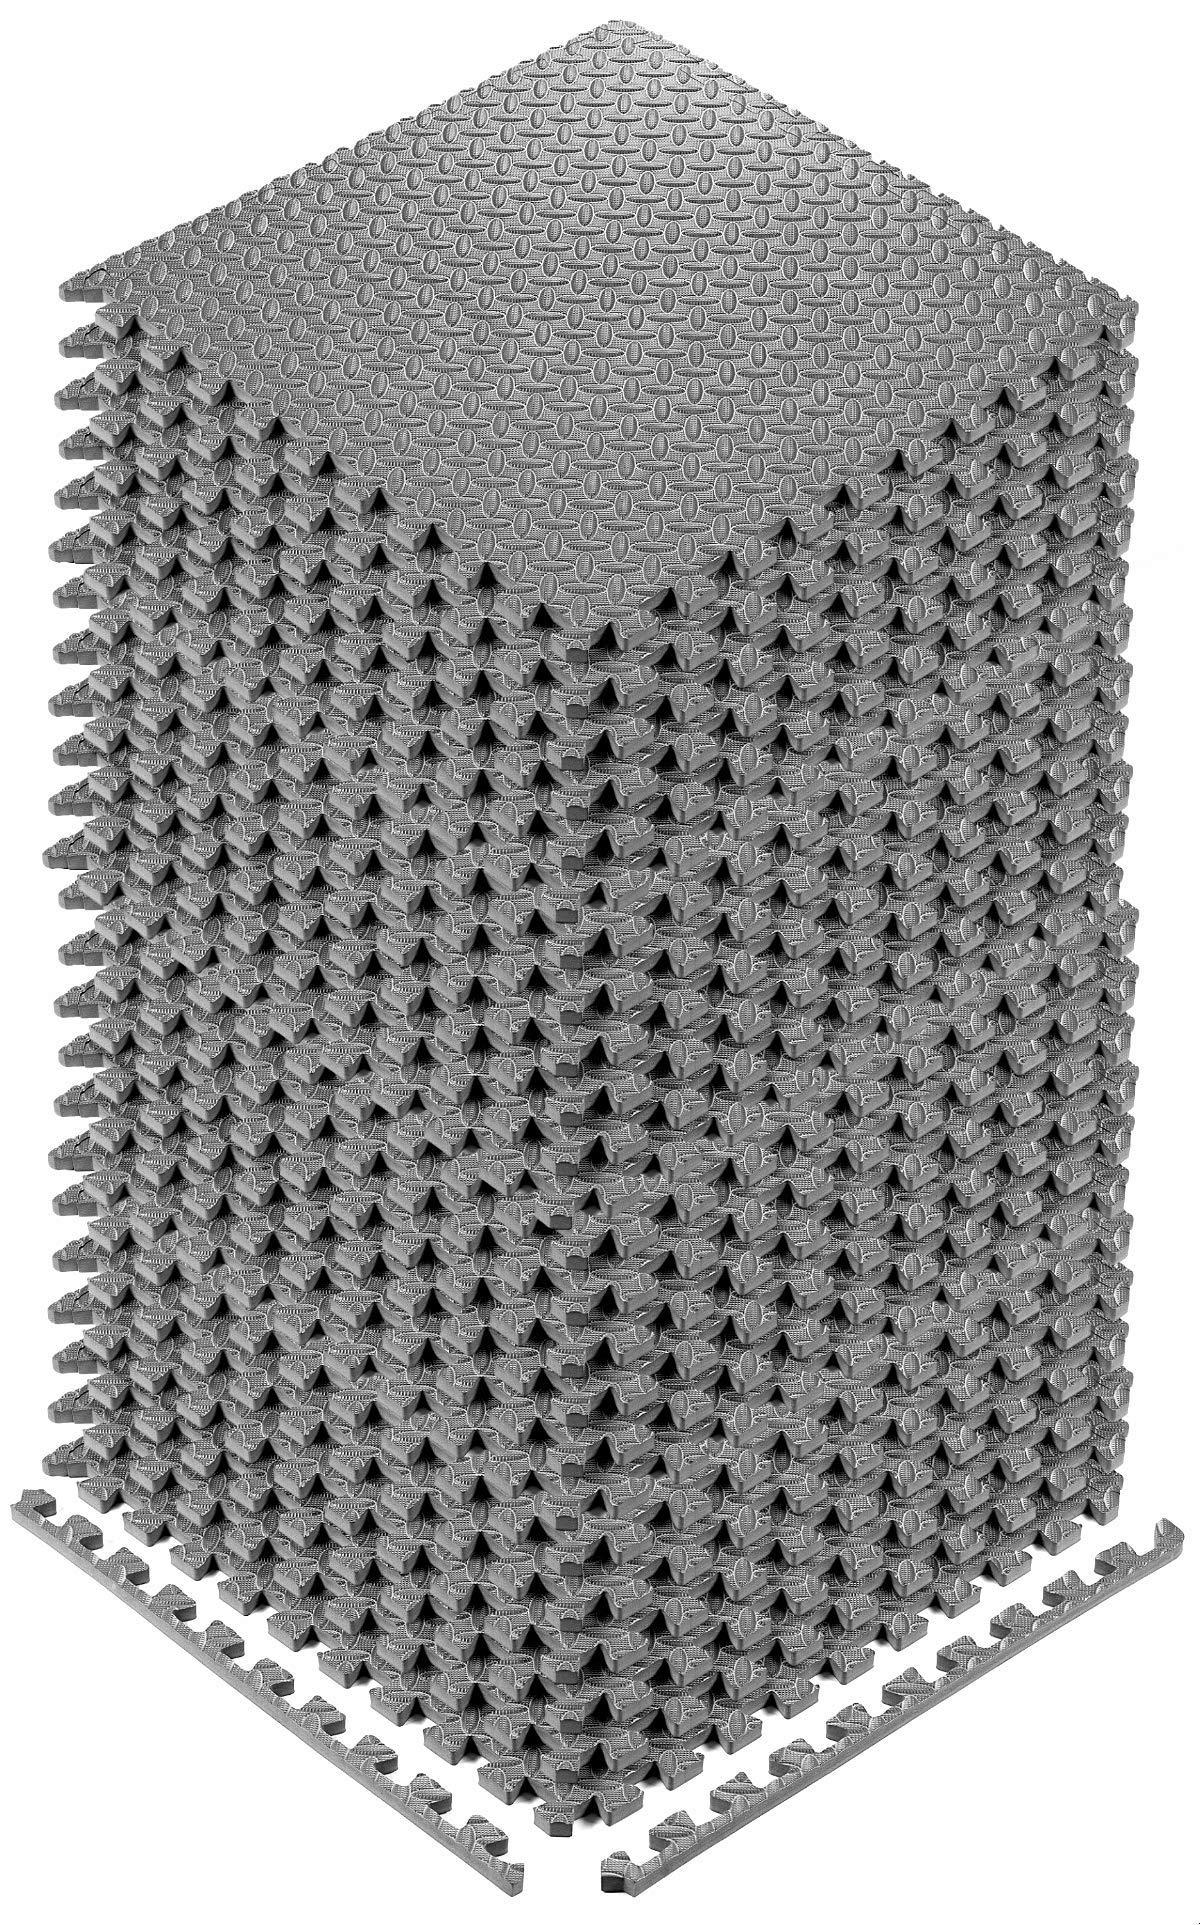 YOGU Puzzle Exercise Floor Mat EVA Interlocking Foam Tiles 24 Tiles Covers 96 SQ Foot Exercise Equipment Mat Protective Flooring for Home Gym (Grey)